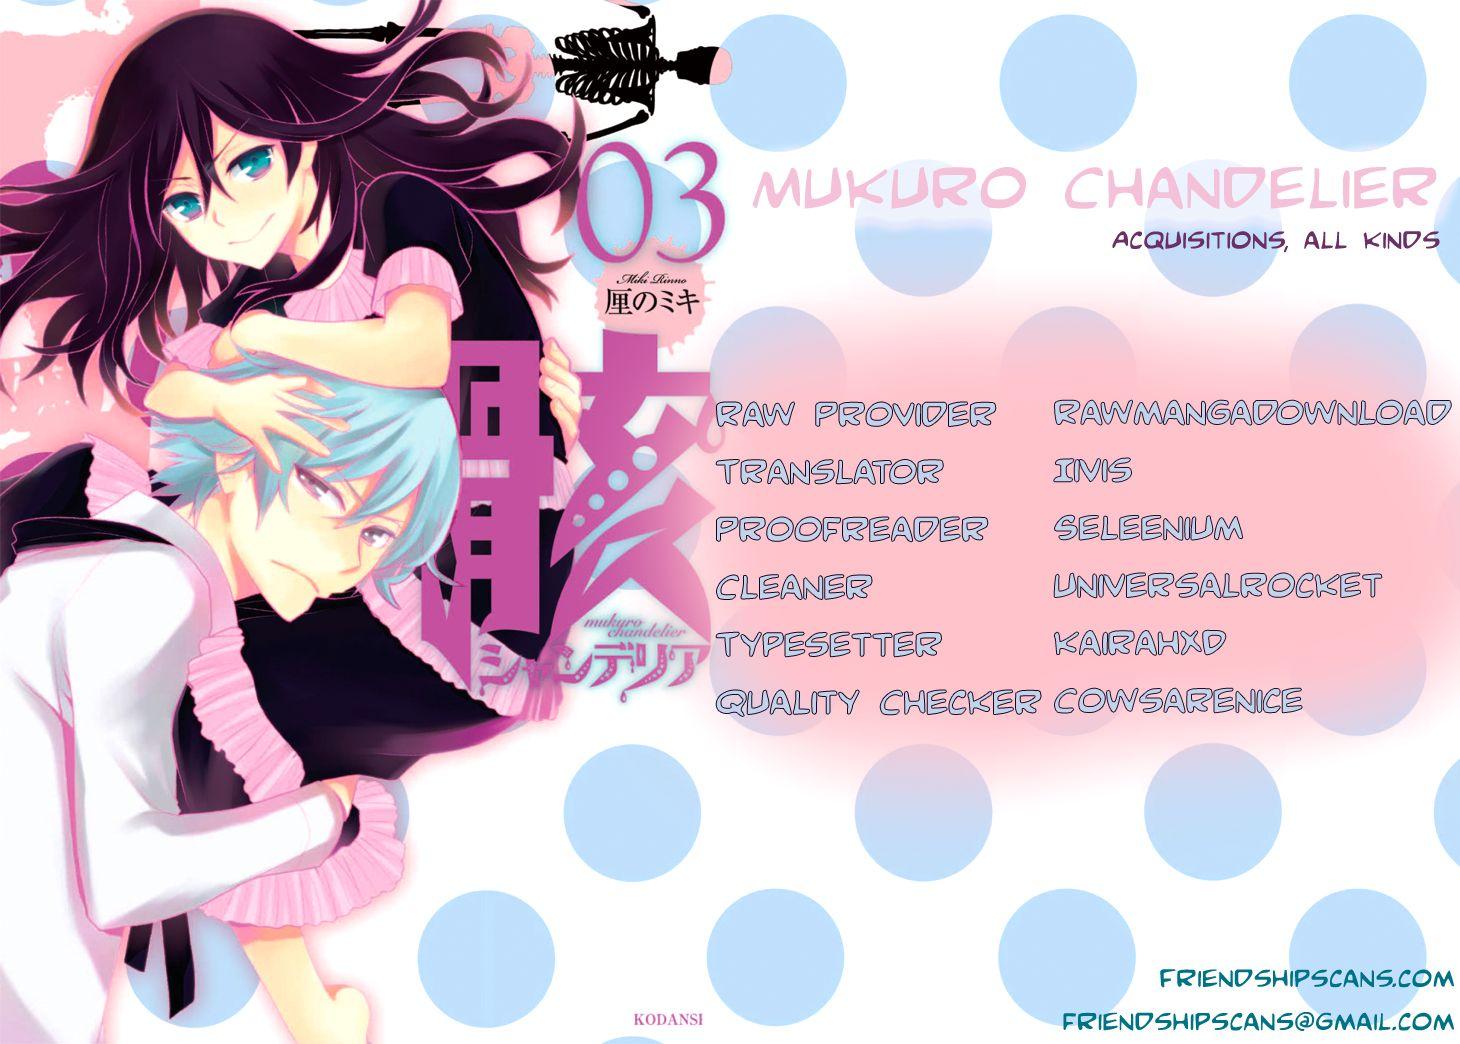 Mukuro Chandelier 3 Page 1